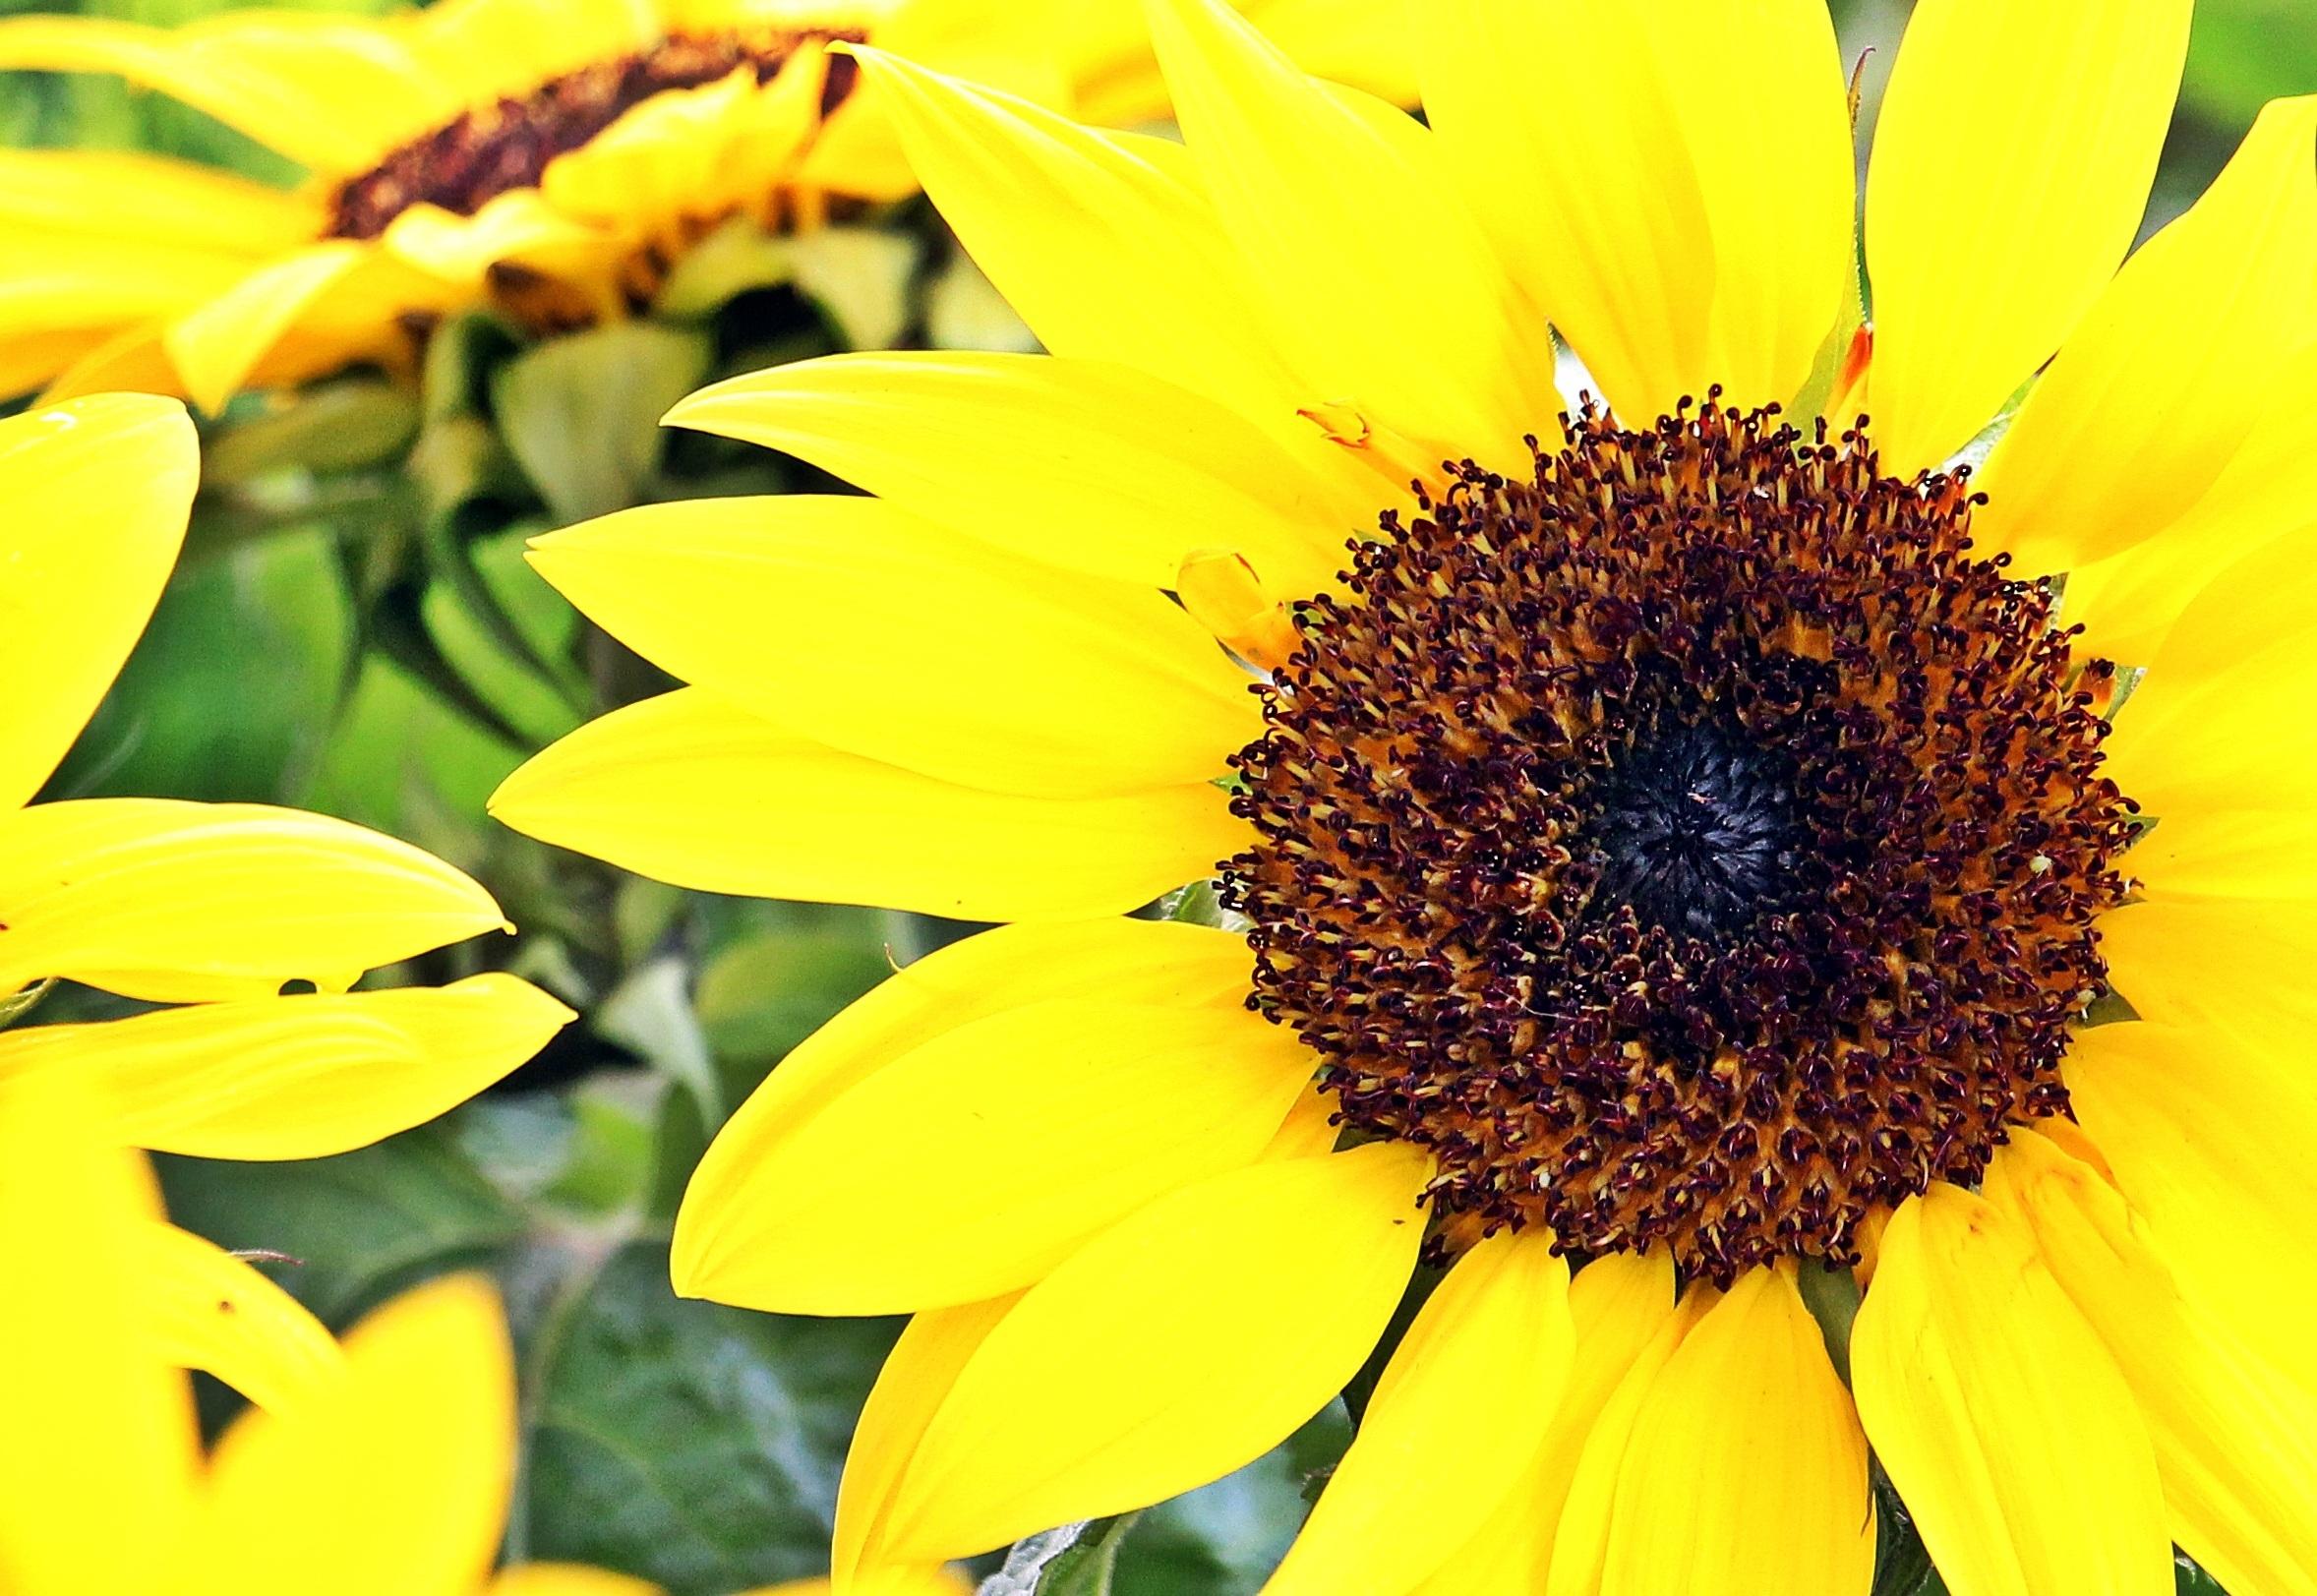 Sunflower Field, Seed, Nature, Sun, Macro, HQ Photo